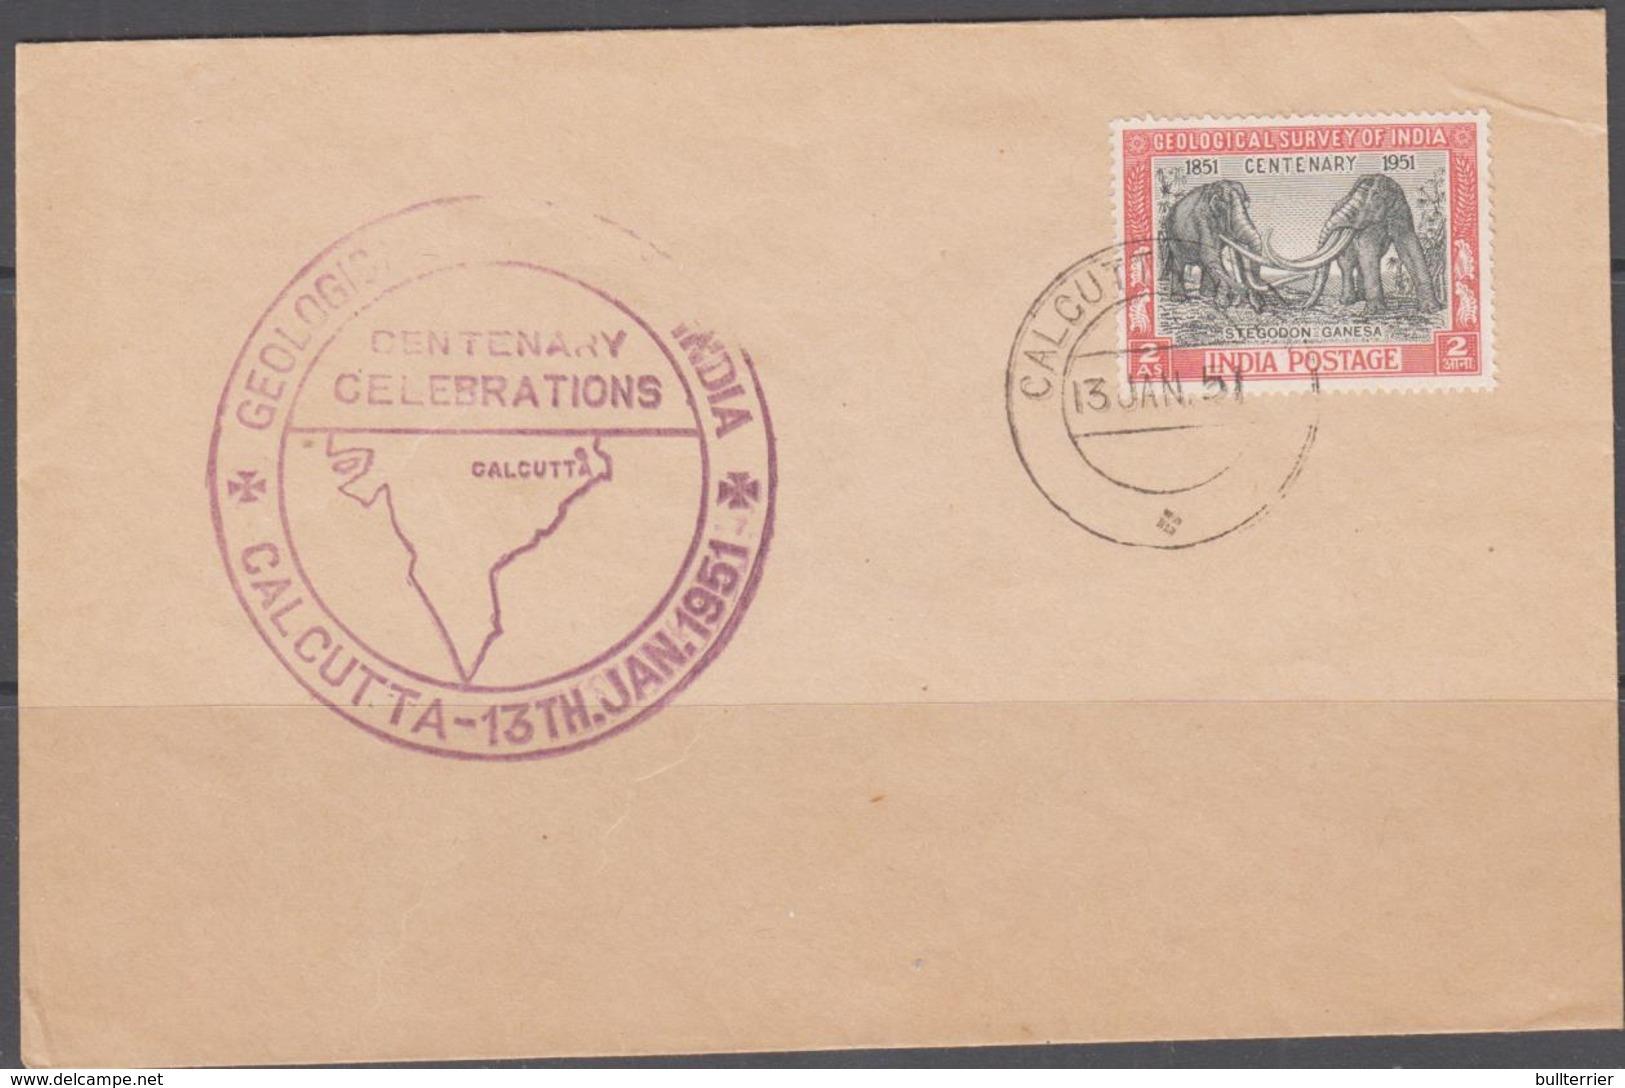 PREHISTORIC ANIMALS - INDIA - 1951 - STEGODON FDC WITH GEOLOGICAL CACHET  AND CALCUTTA POSTMARK - Briefmarken